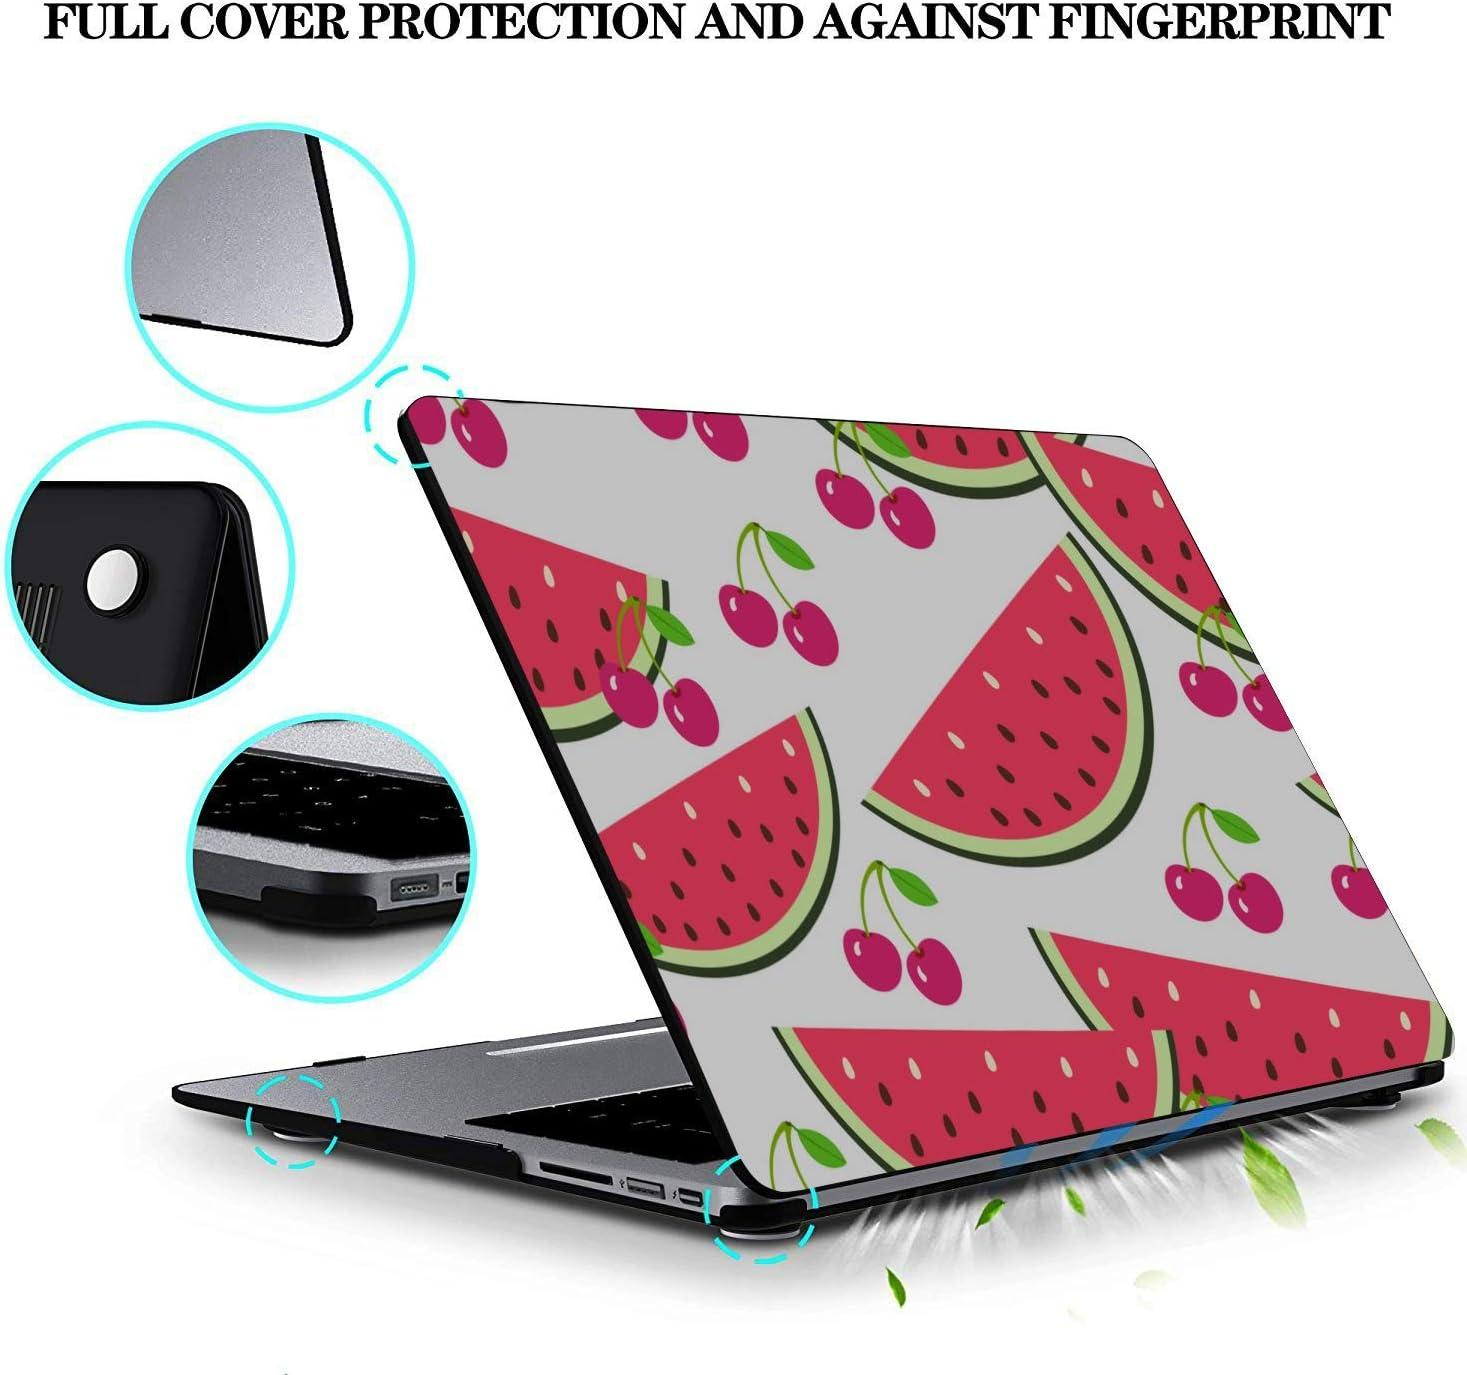 MacBook 11 Inch Case Summer Fashion Cute Fruit Watermelon Plastic Hard Shell Compatible Mac Air 11 Pro 13 15 Case for MacBook Air Protection for MacBook 2016-2019 Version